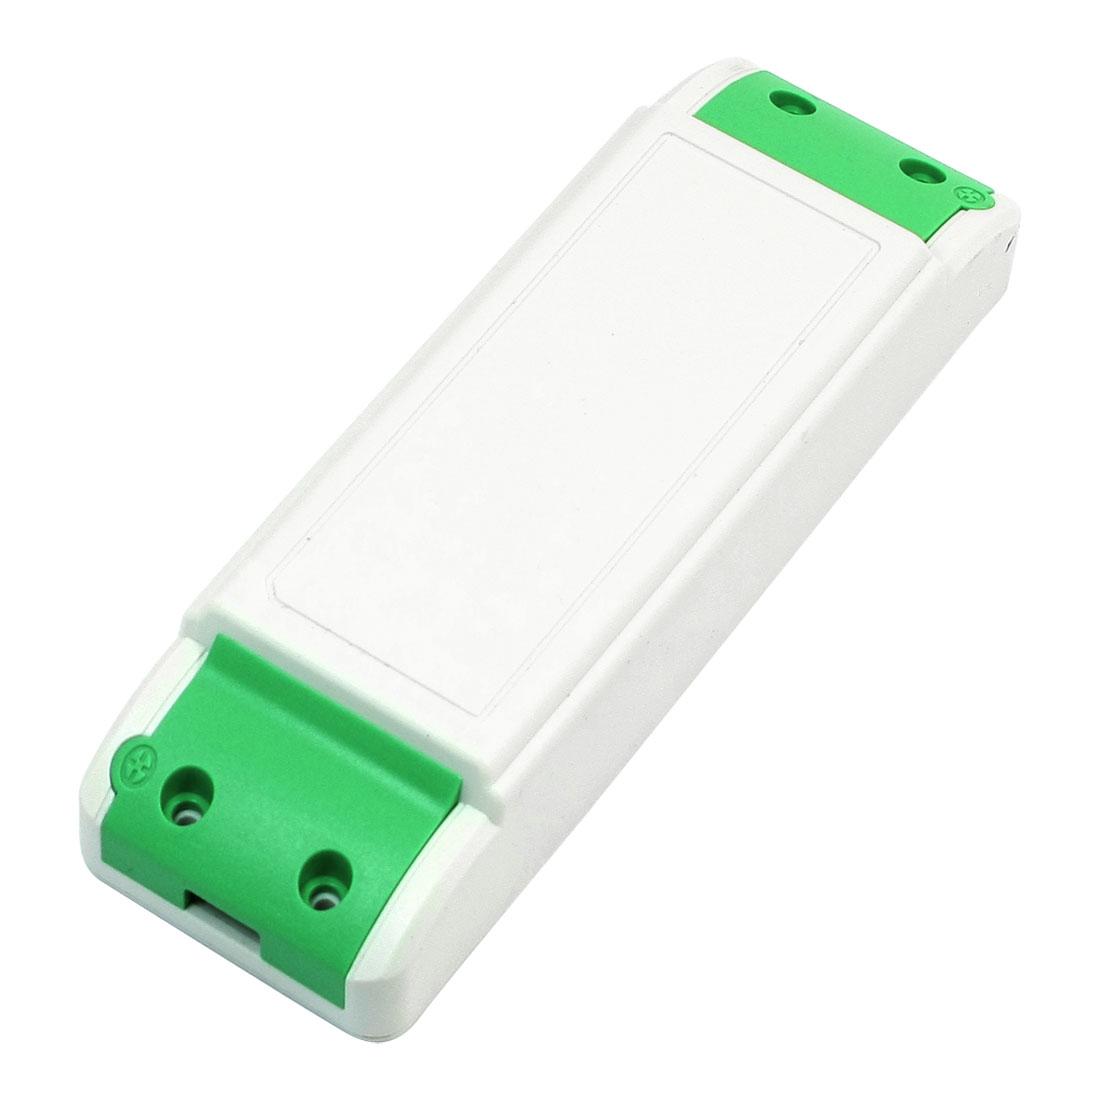 LED Driver Power Supply Plastic Shell Junction Box 140mm x 45mm x 28mm